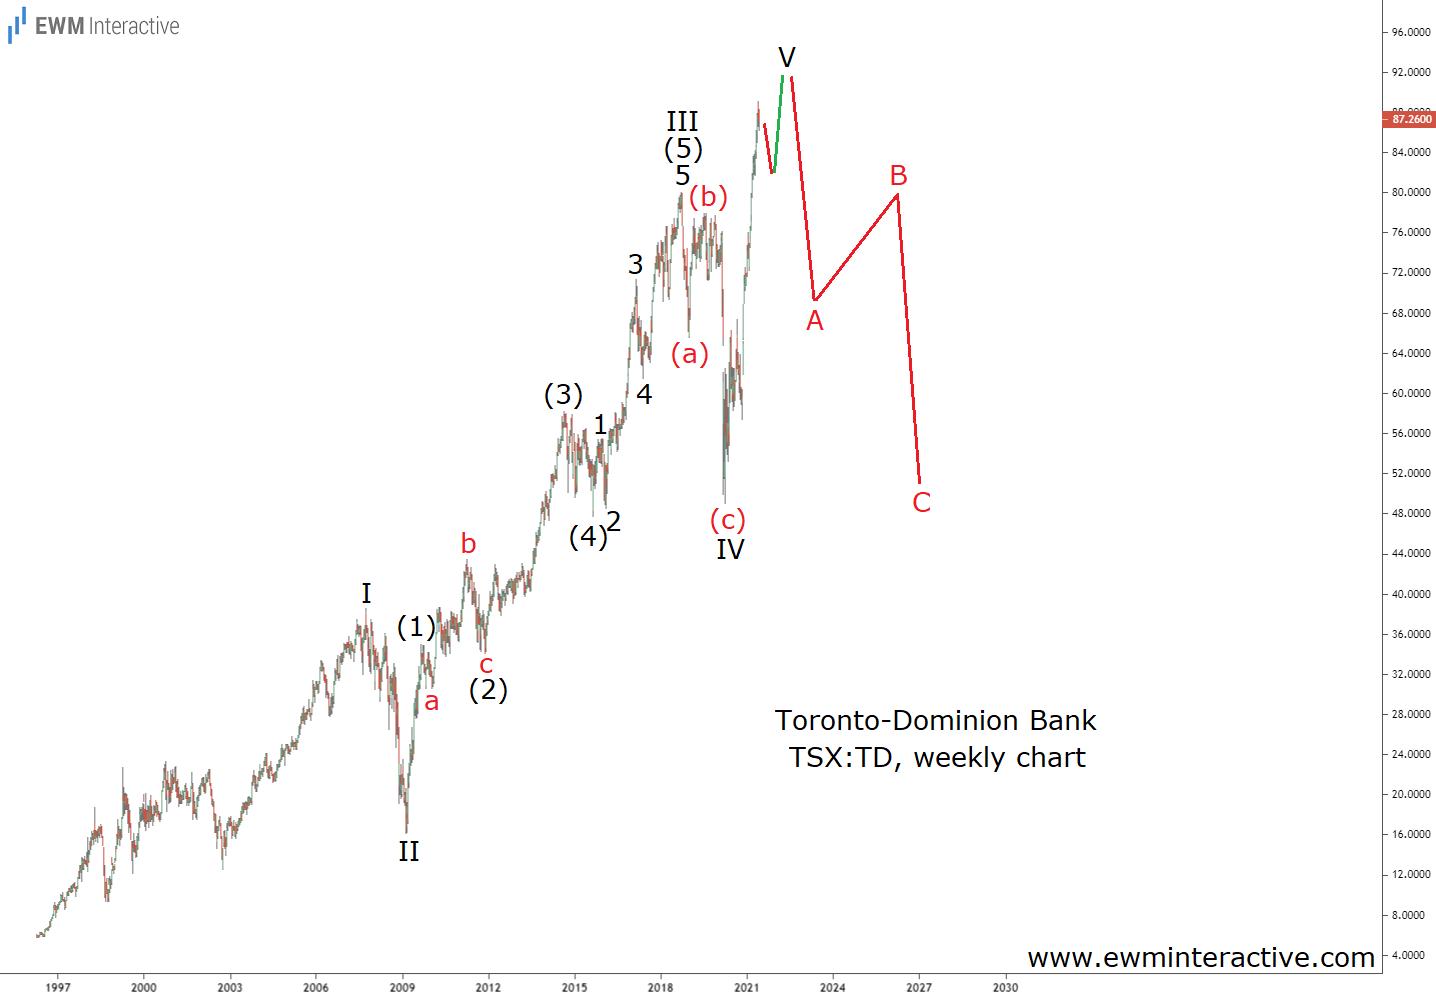 Toronto-Dominion Bank Weekly Chart